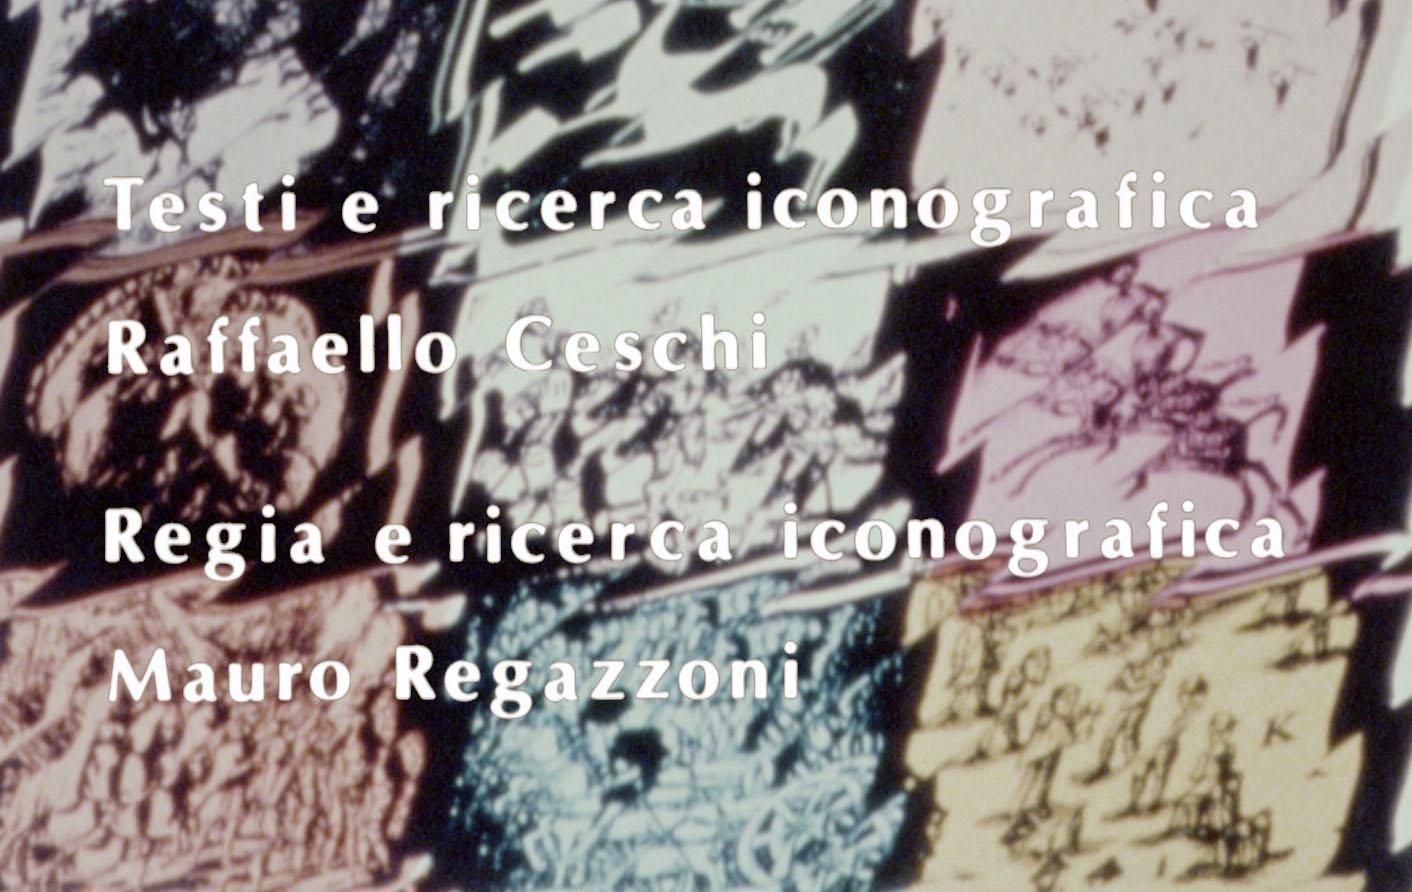 rsi.ch/srg/notrehistoire/acqua...